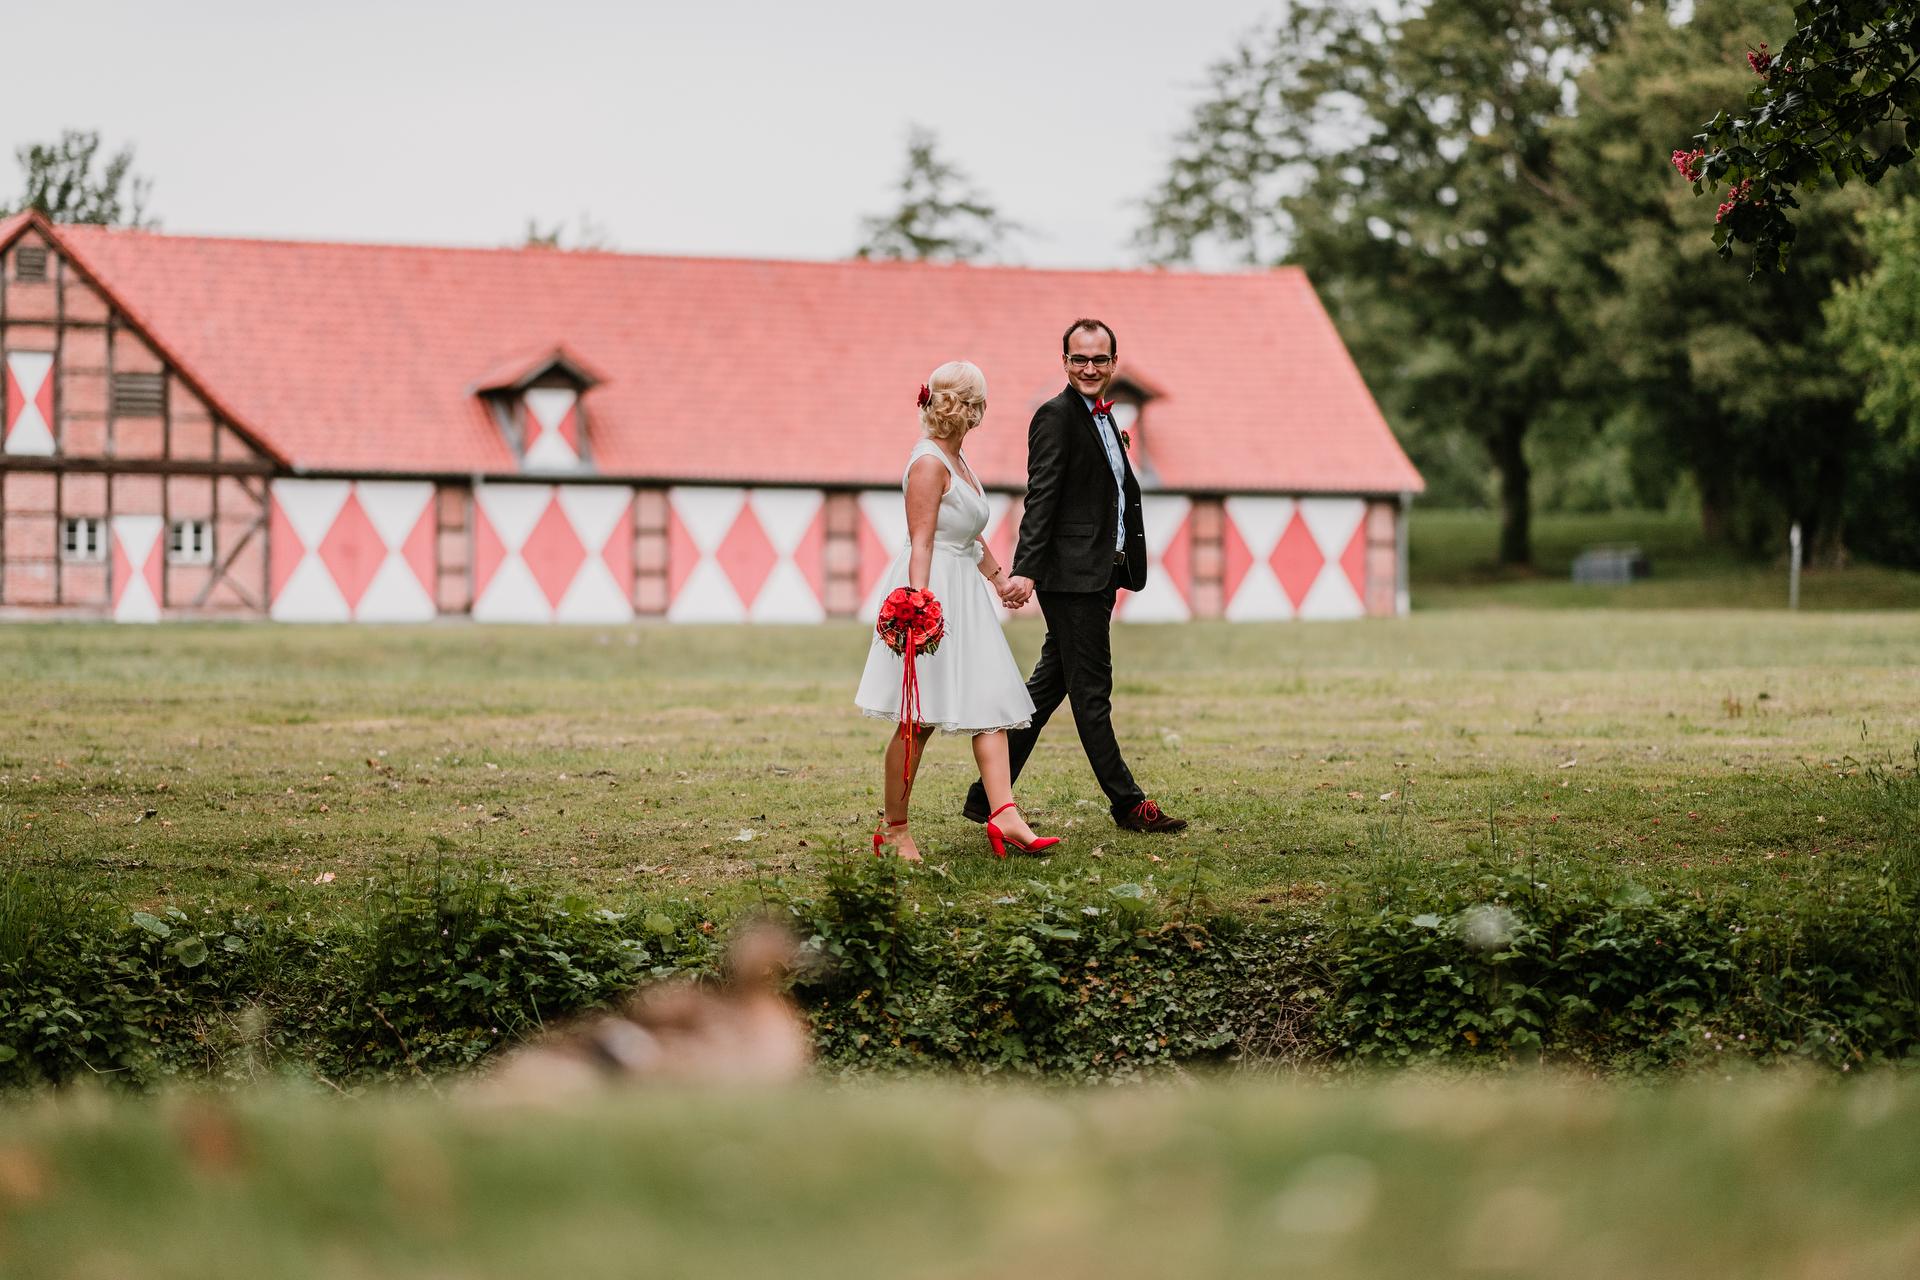 Hzt-Ann-Christin-Stefan-Standesamt-05-2019-027